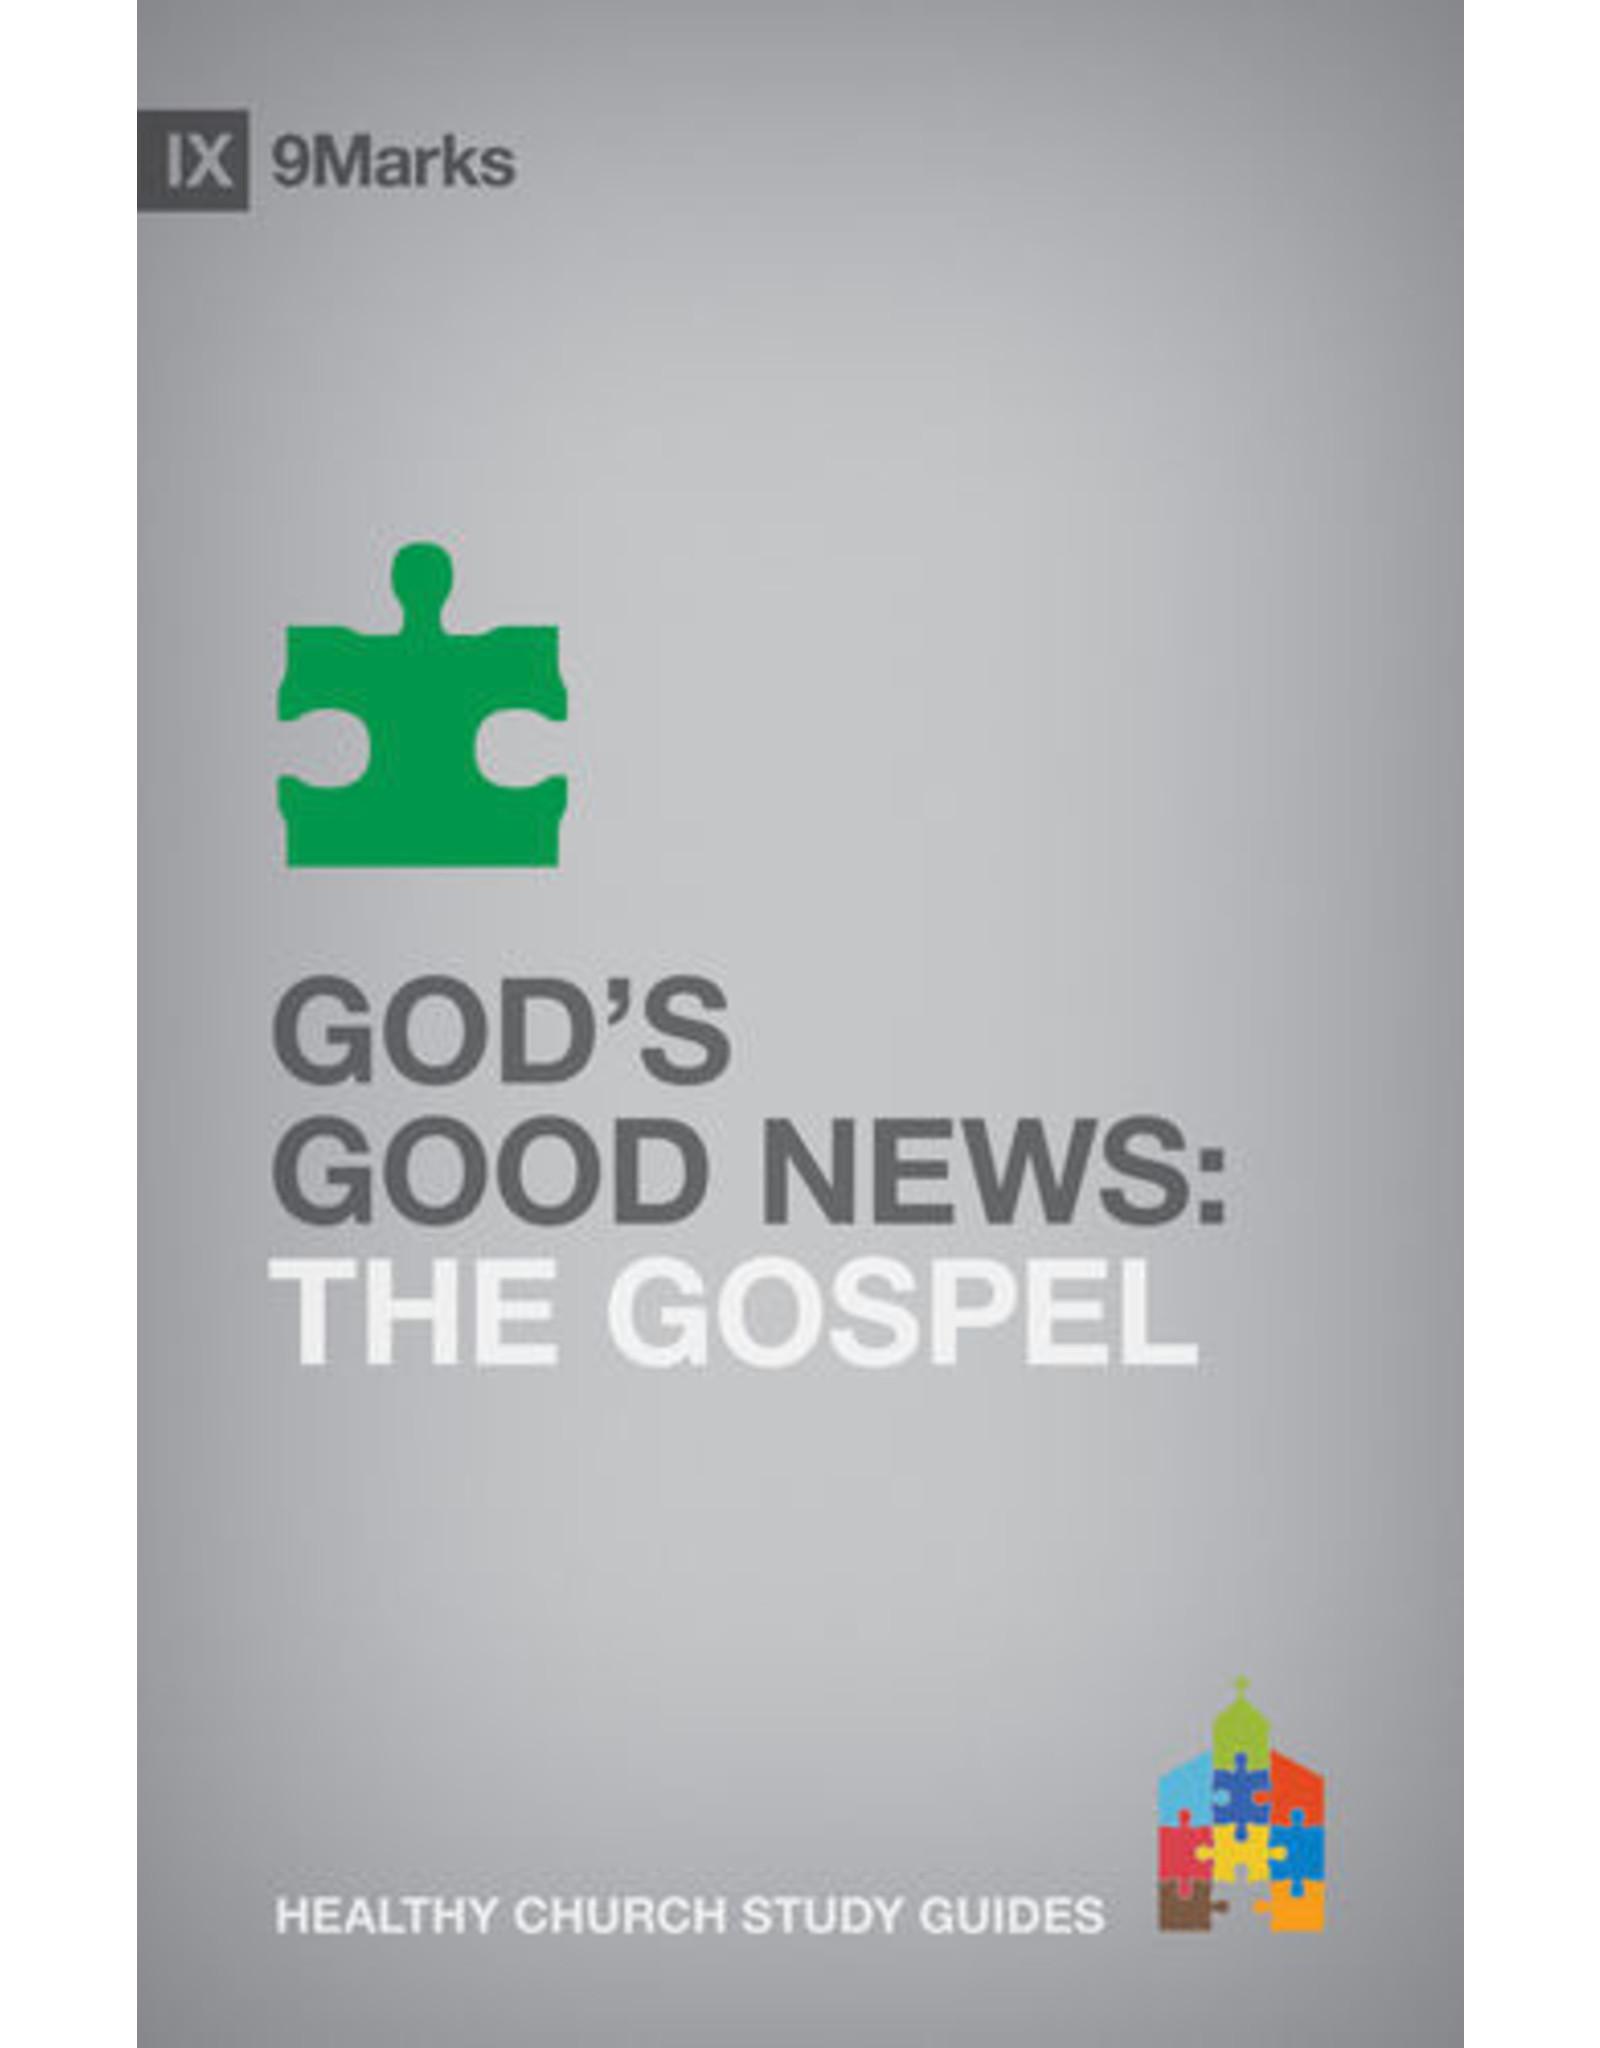 Jamieson God's Good News: IX Marks